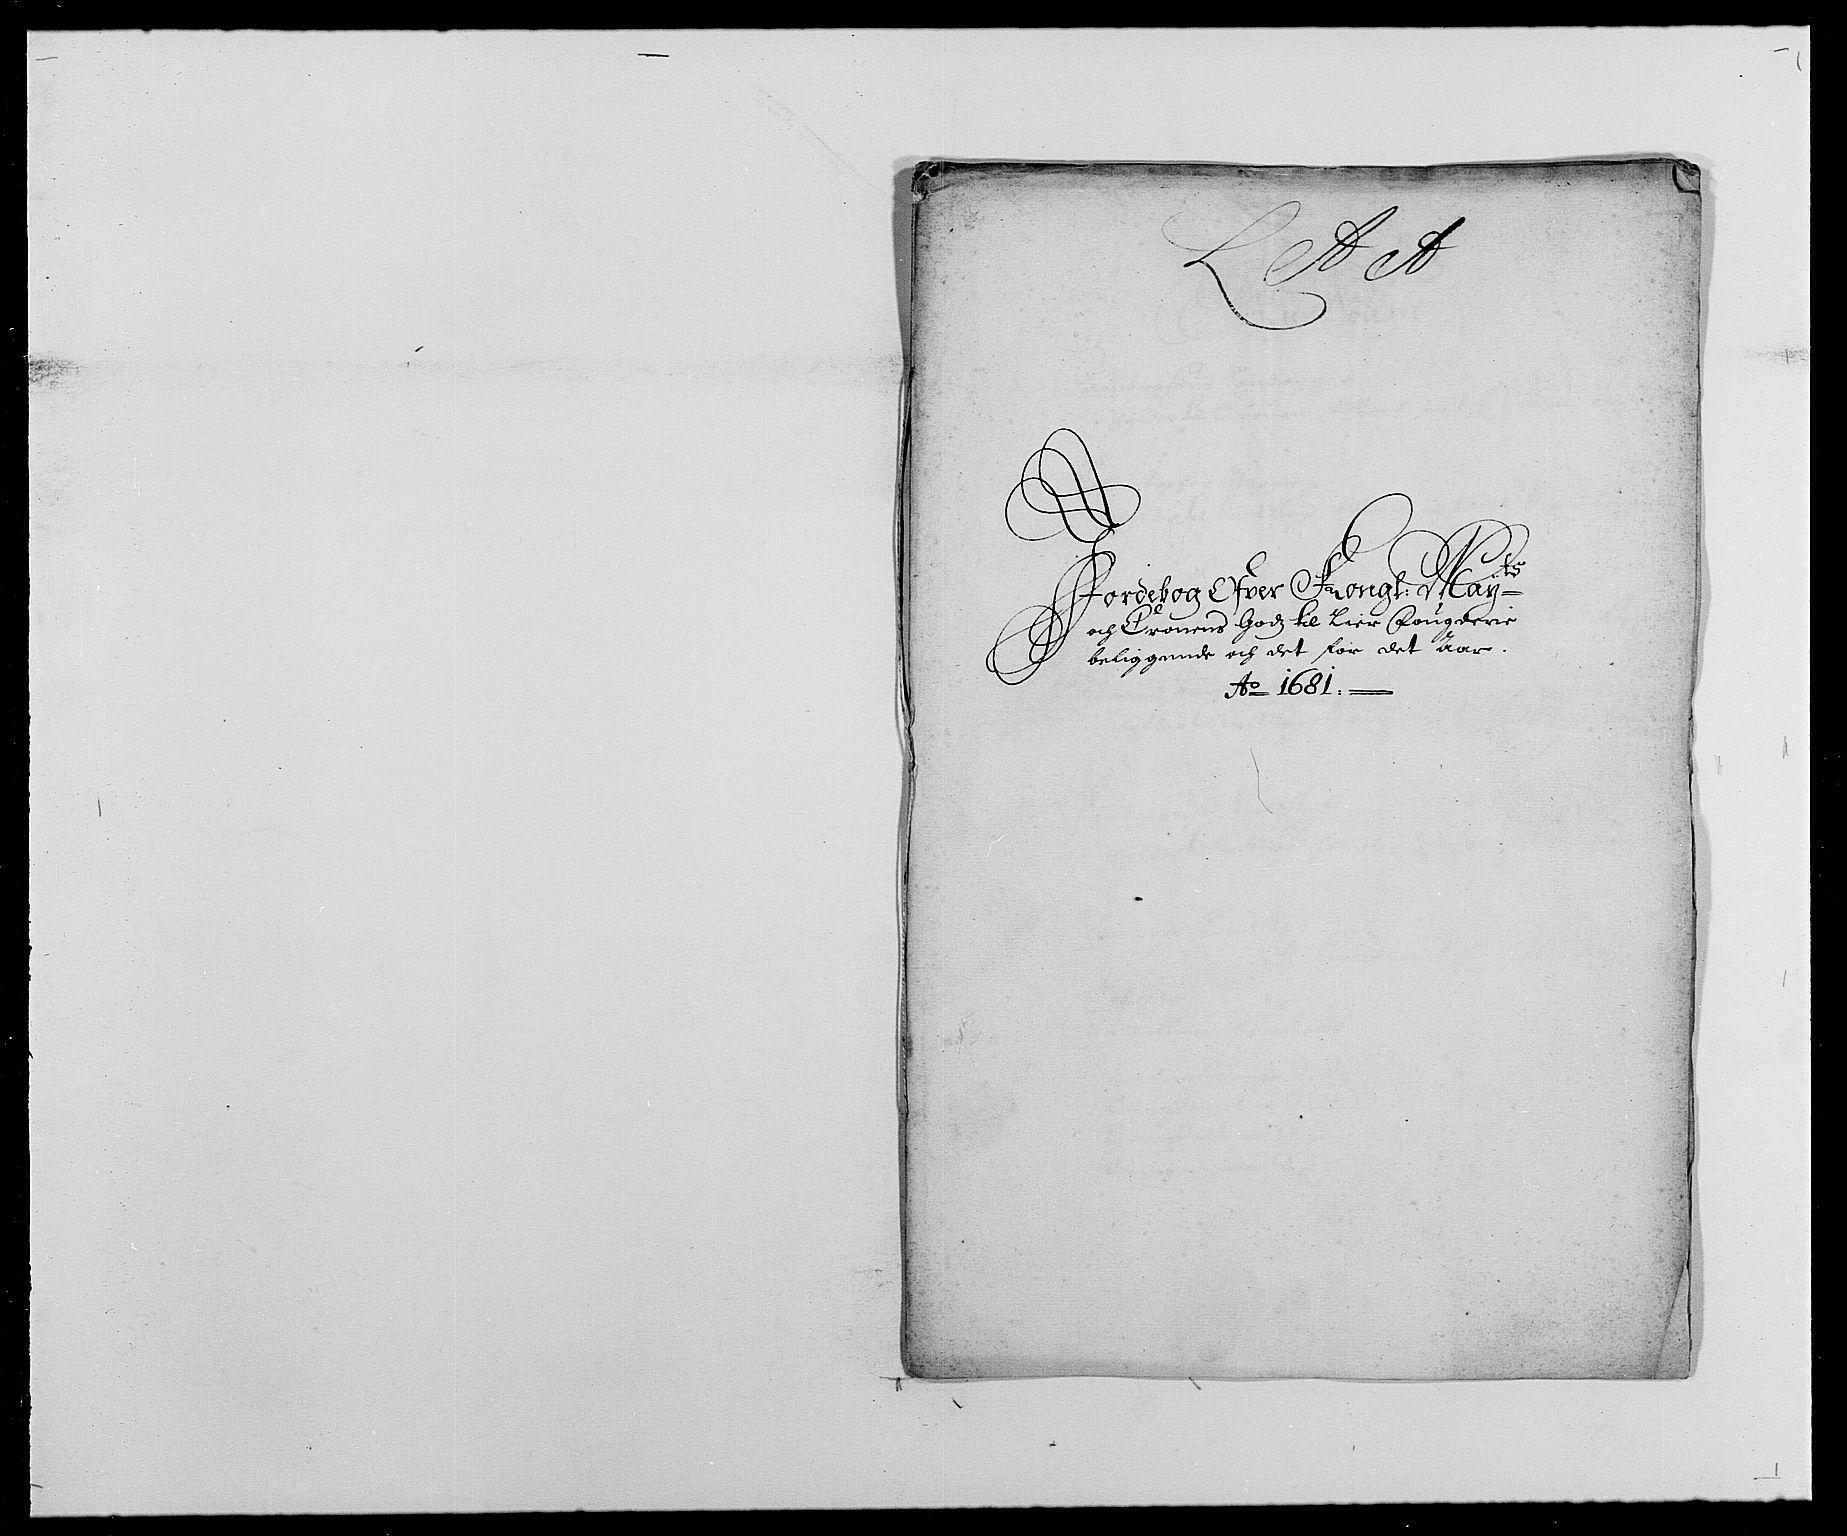 RA, Rentekammeret inntil 1814, Reviderte regnskaper, Fogderegnskap, R27/L1686: Fogderegnskap Lier, 1678-1686, s. 297